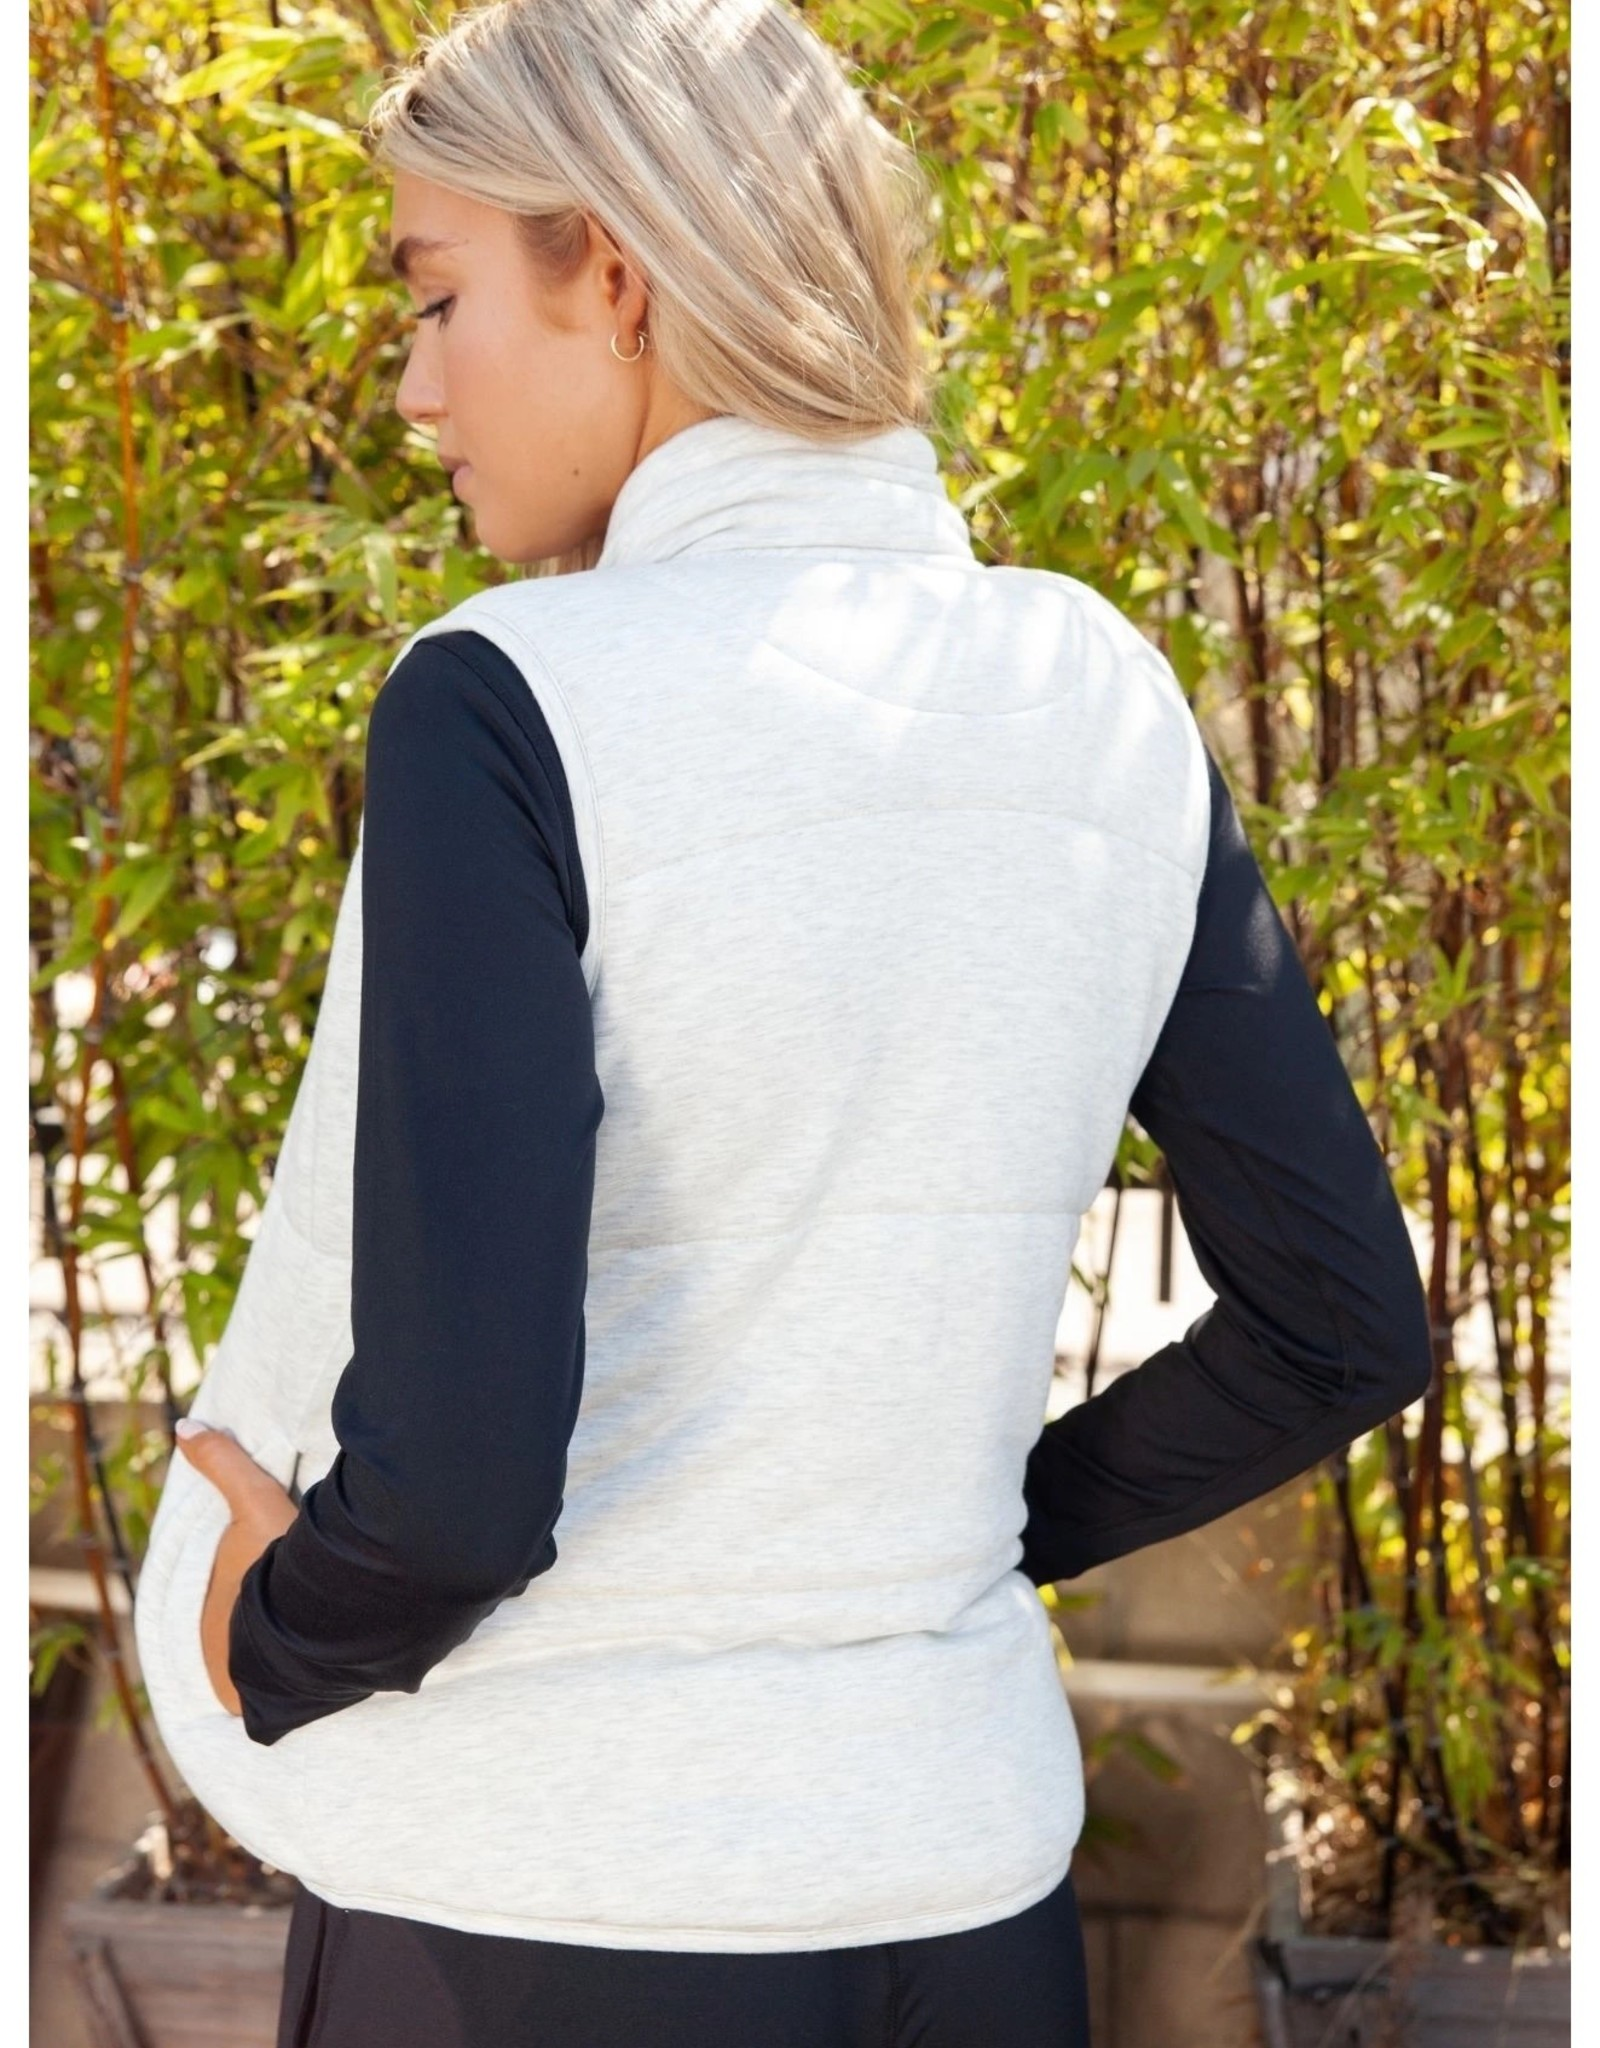 THREAD & SUPPLY Echo Vest